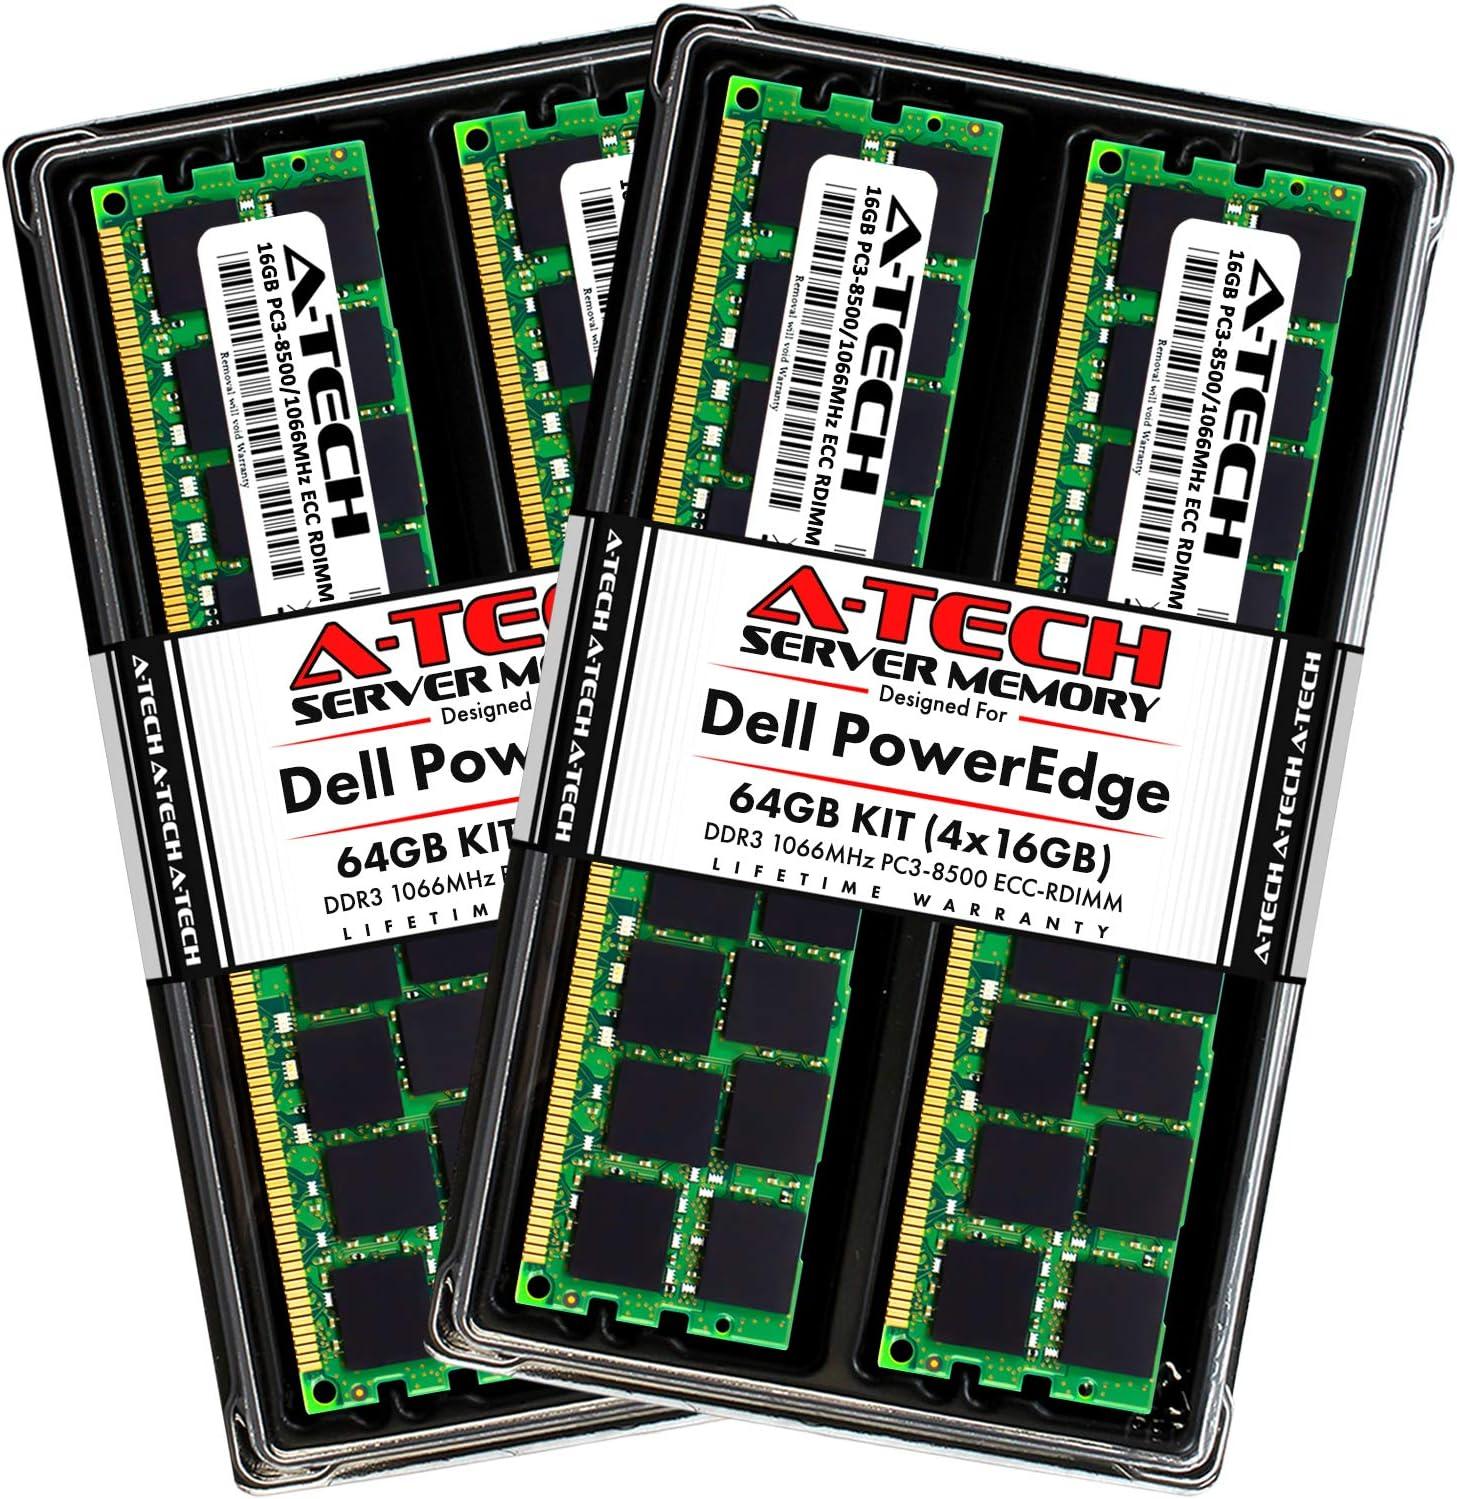 A-Tech 64GB (4x16GB) RAM for Dell PowerEdge R810, R810 II, R910, R910 II, M910, M910 II Servers | DDR3 1066MHz ECC-RDIMM PC3-8500 4Rx4 1.5V 240-Pin ECC Registered DIMM Server Memory Upgrade Kit